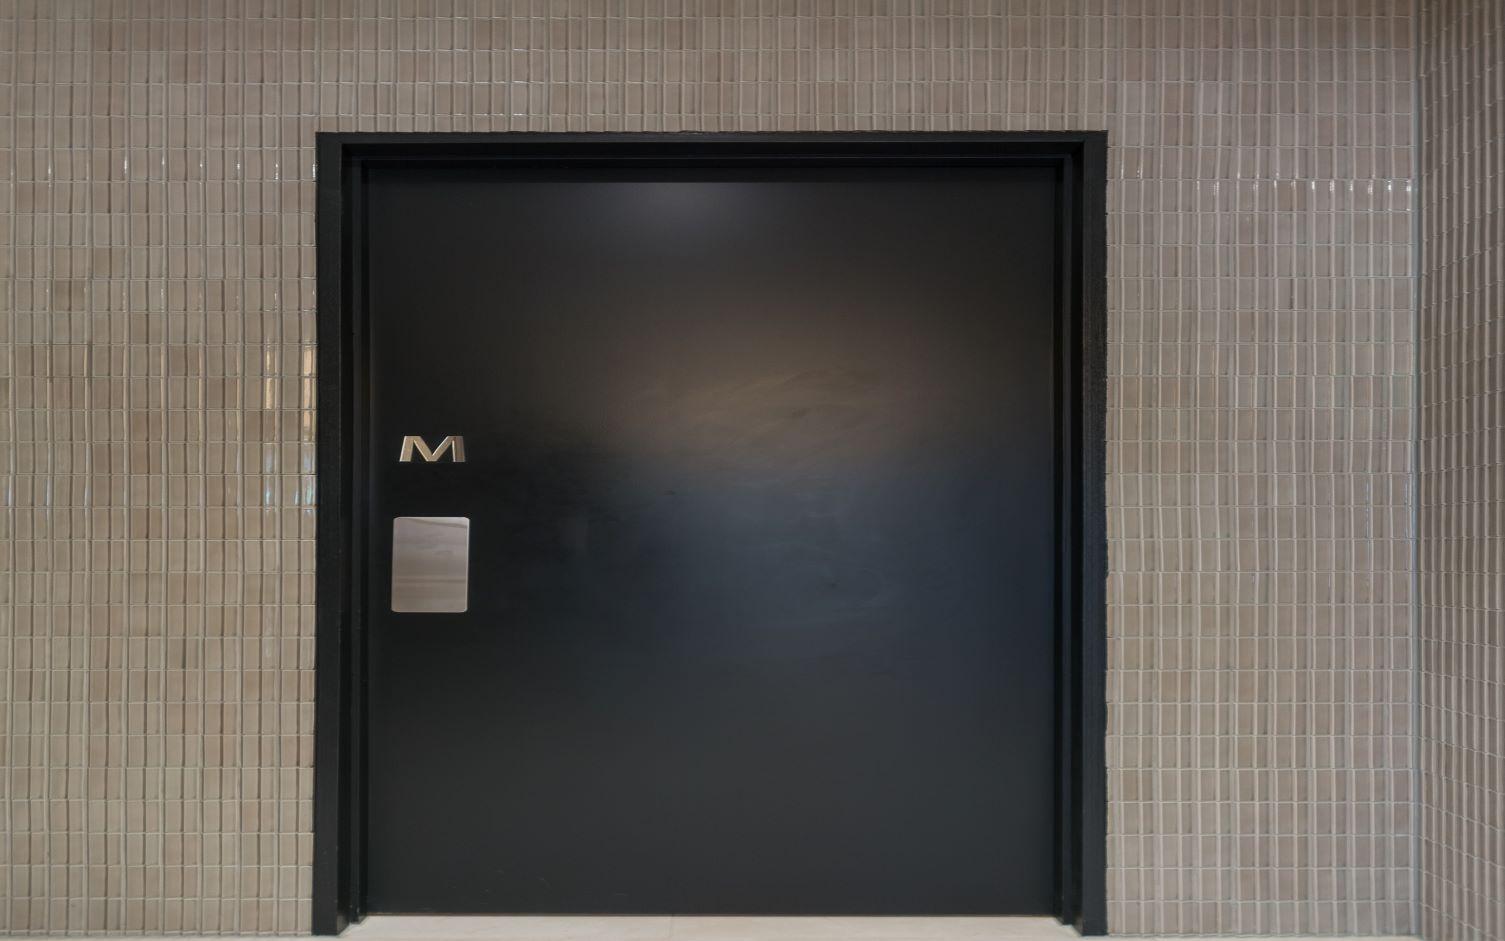 https://ggtiling.com.au/wp-content/uploads/2019/08/G-G-Tiling-Commercial-Zagame-Auto_1.jpg